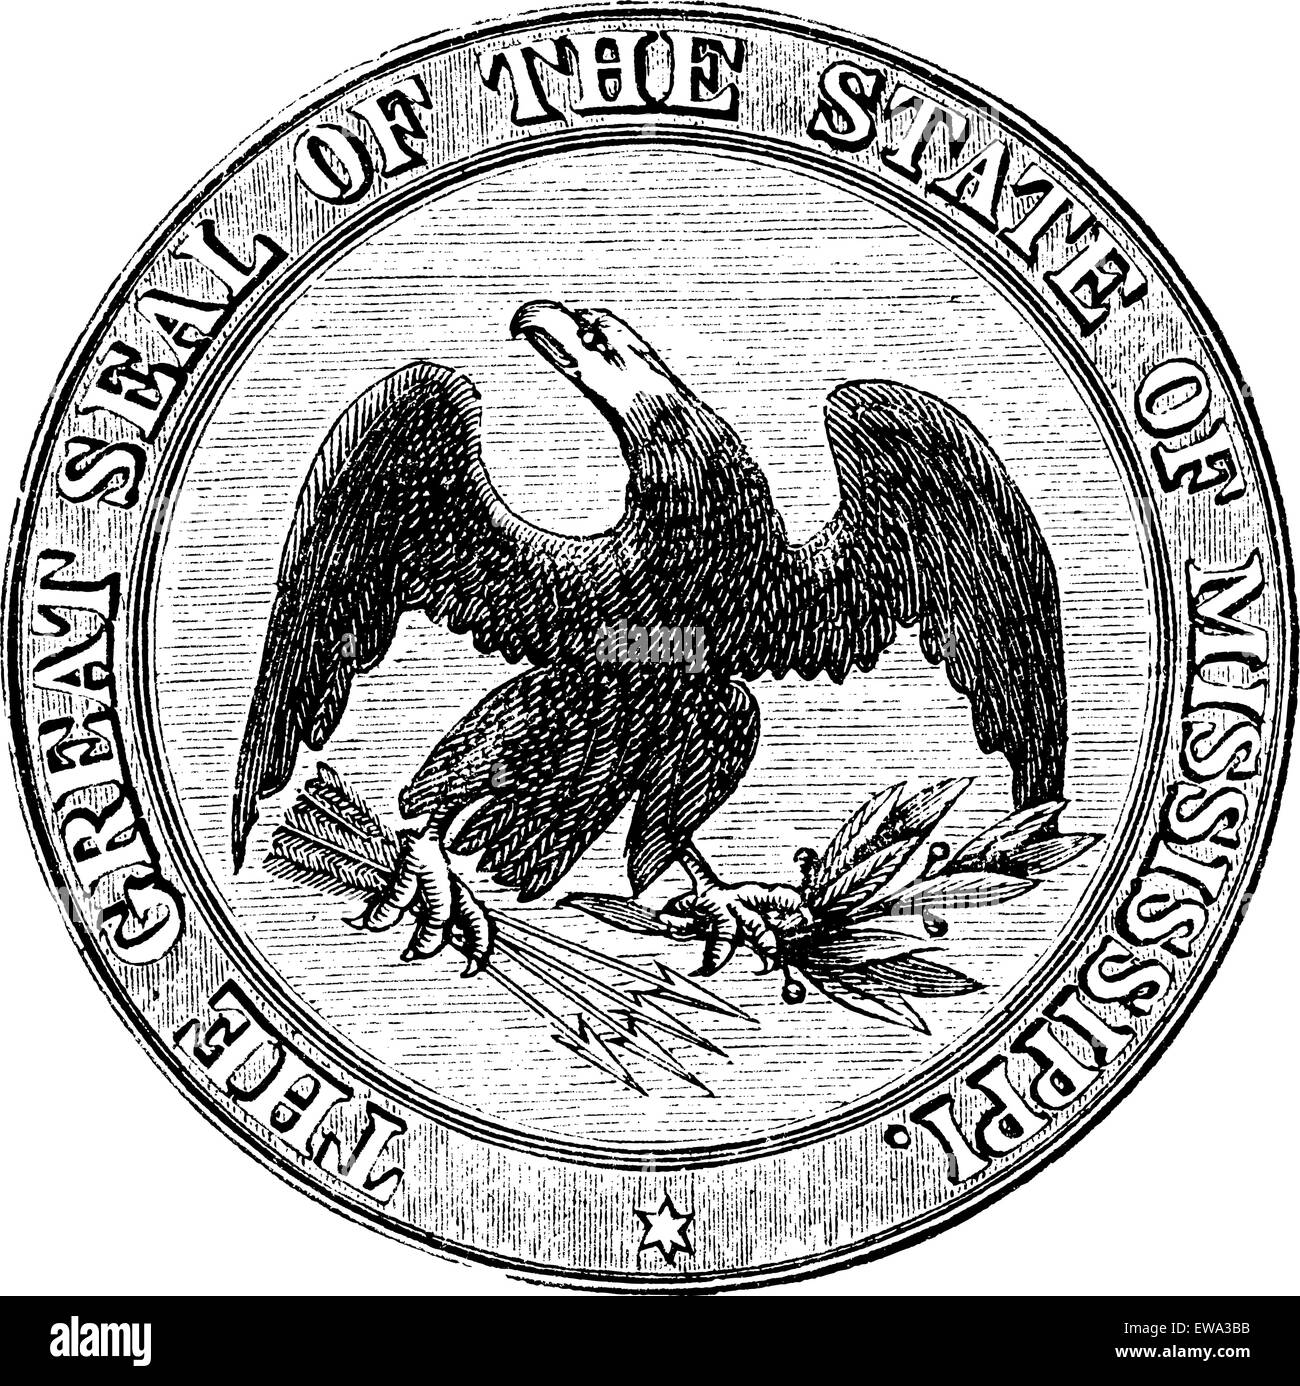 Seal of the State of Mississippi, vintage engraved illustration. Trousset encyclopedia (1886 - 1891). - Stock Image